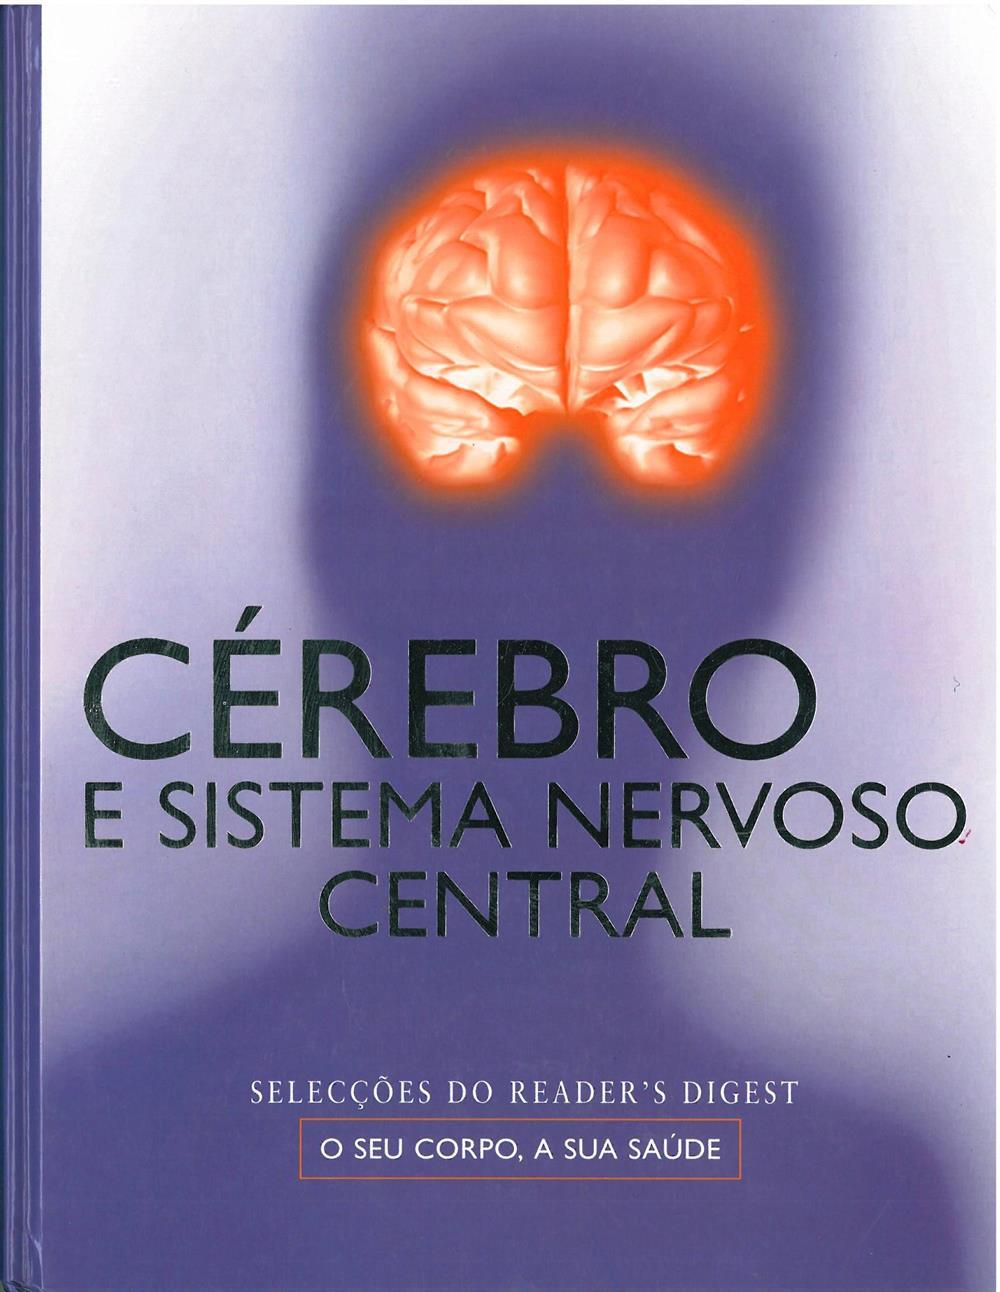 Cérebro e sistema nervoso central_.jpg